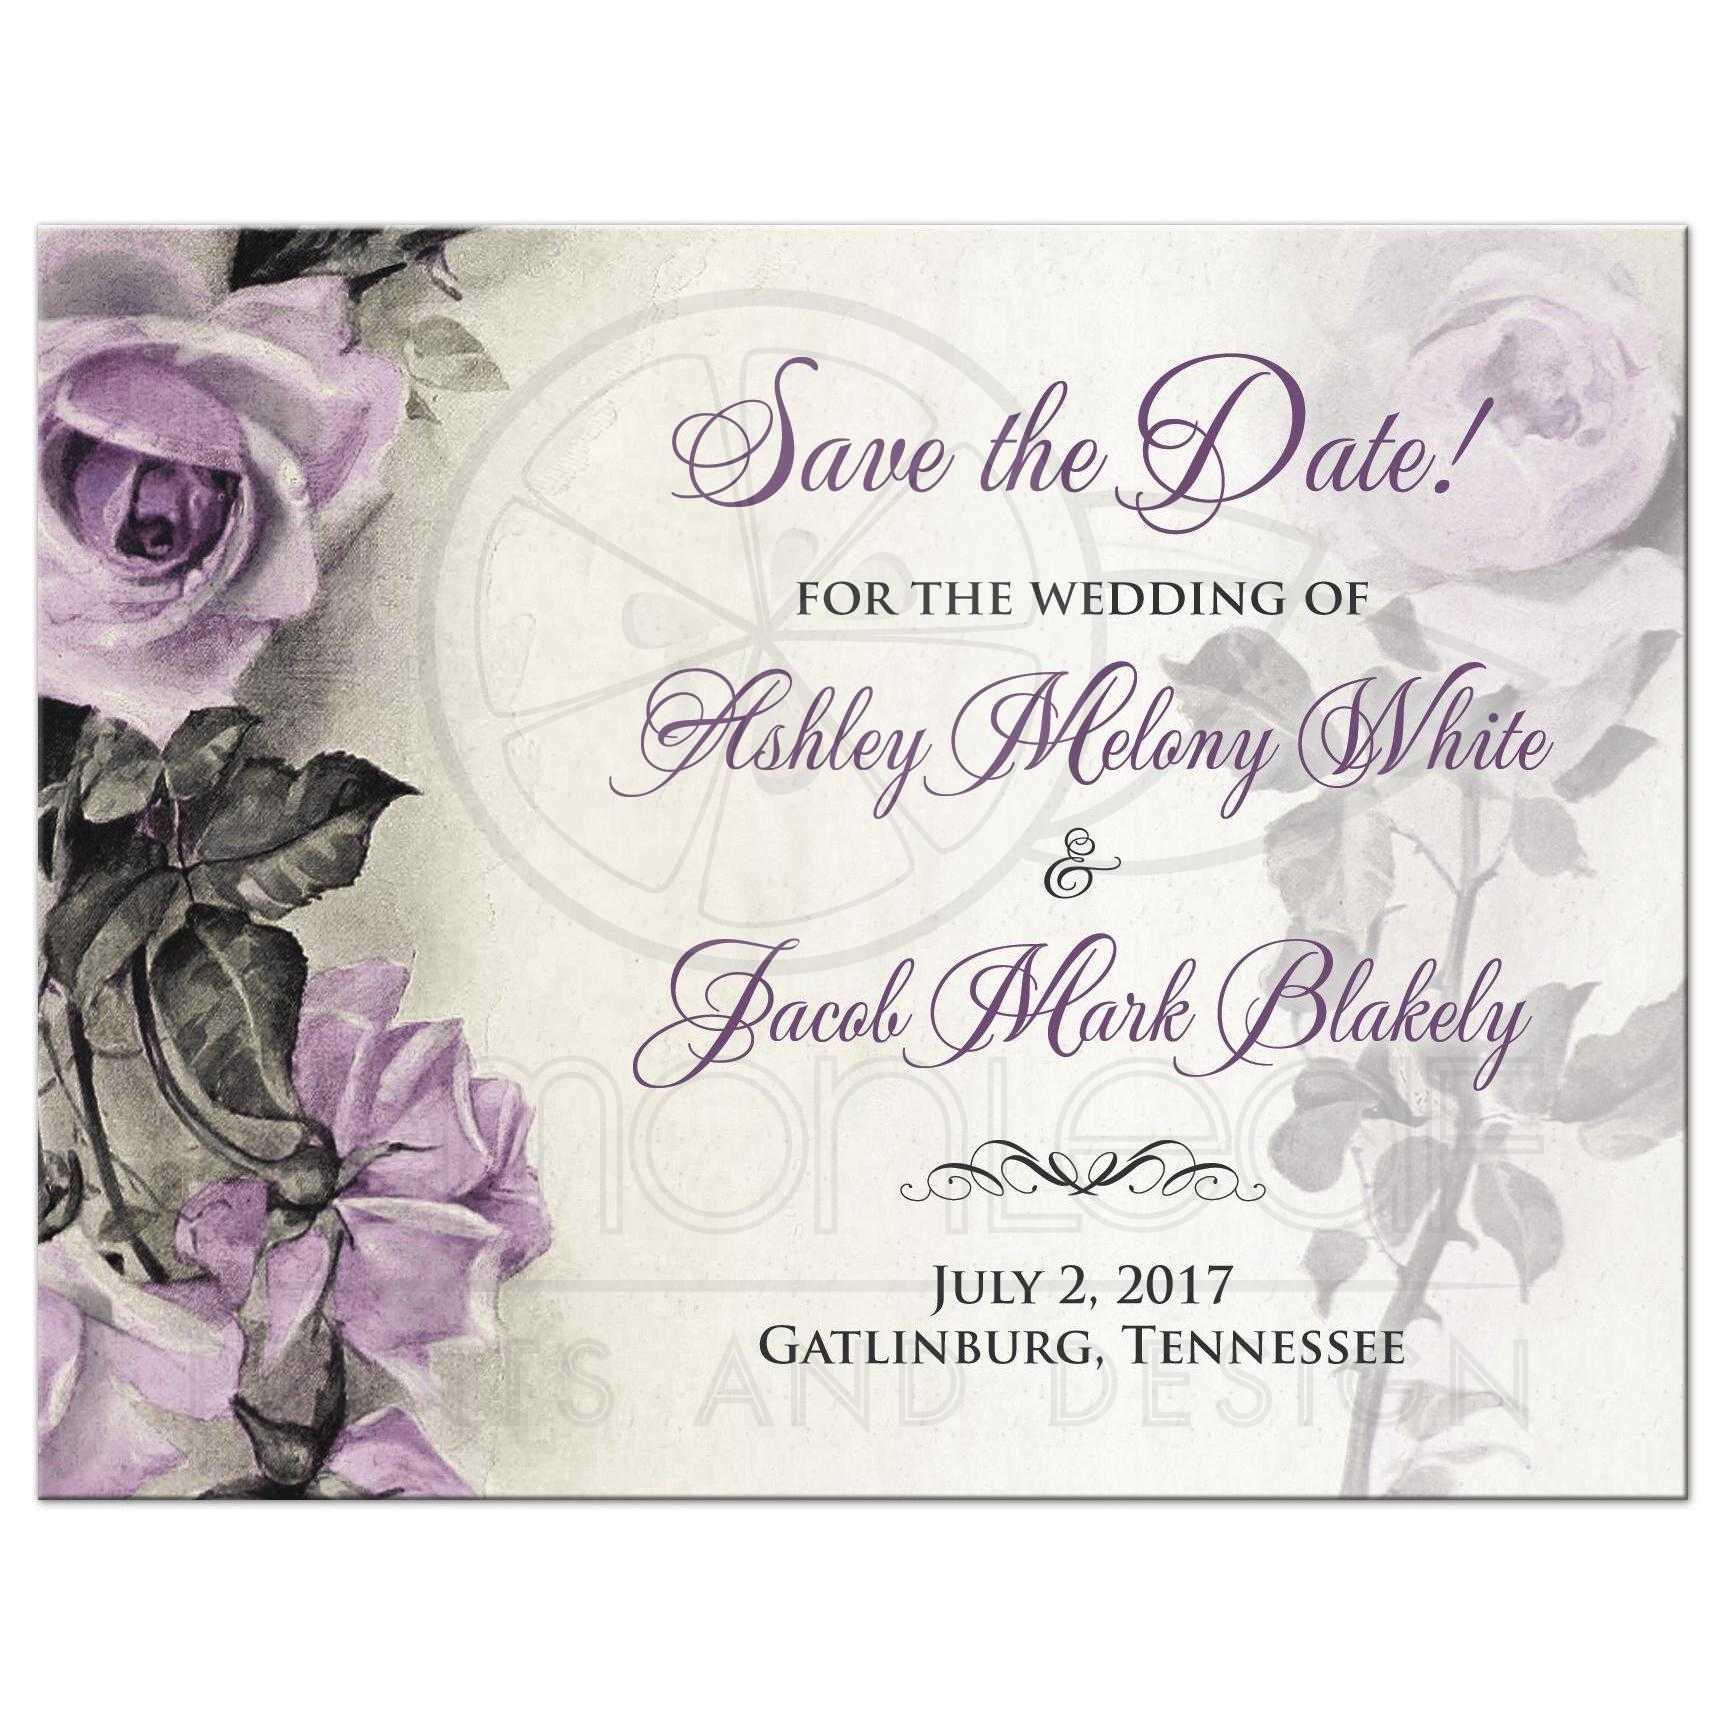 Vintage Mauve Purple Rose Wedding Save the Date Postcard